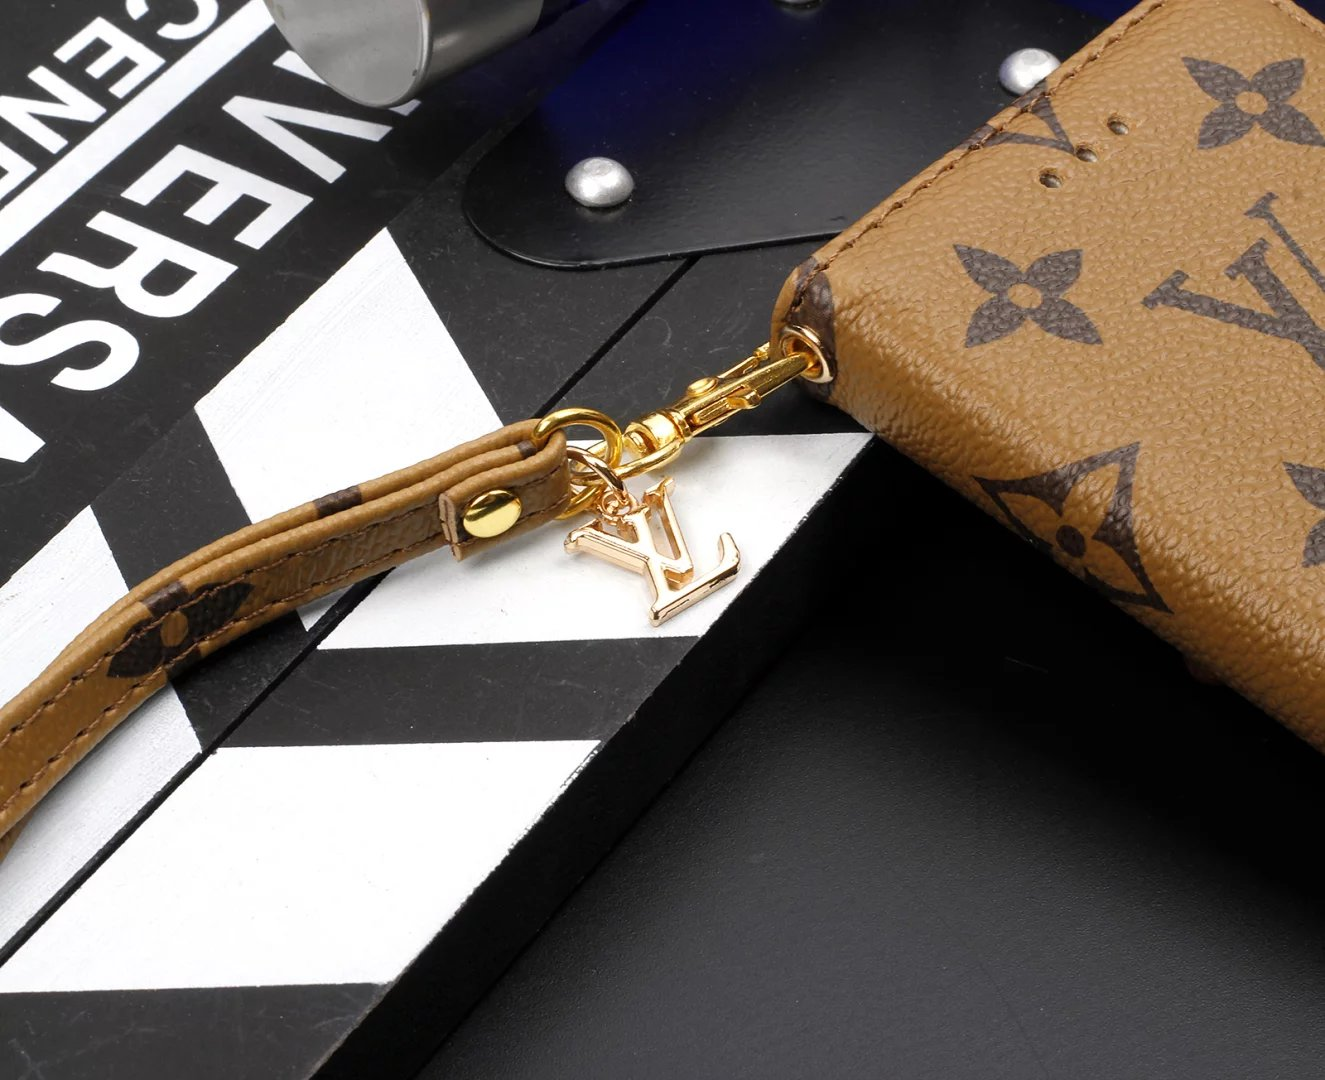 eigene iphone hülle erstellen iphone handyhülle Louis Vuitton iphone 8 hüllen handyhülle online gestalten design handyhülle iphone 8 hülle leder apple neuestes i phone handyhüllen s3 handyhüllen smartphone